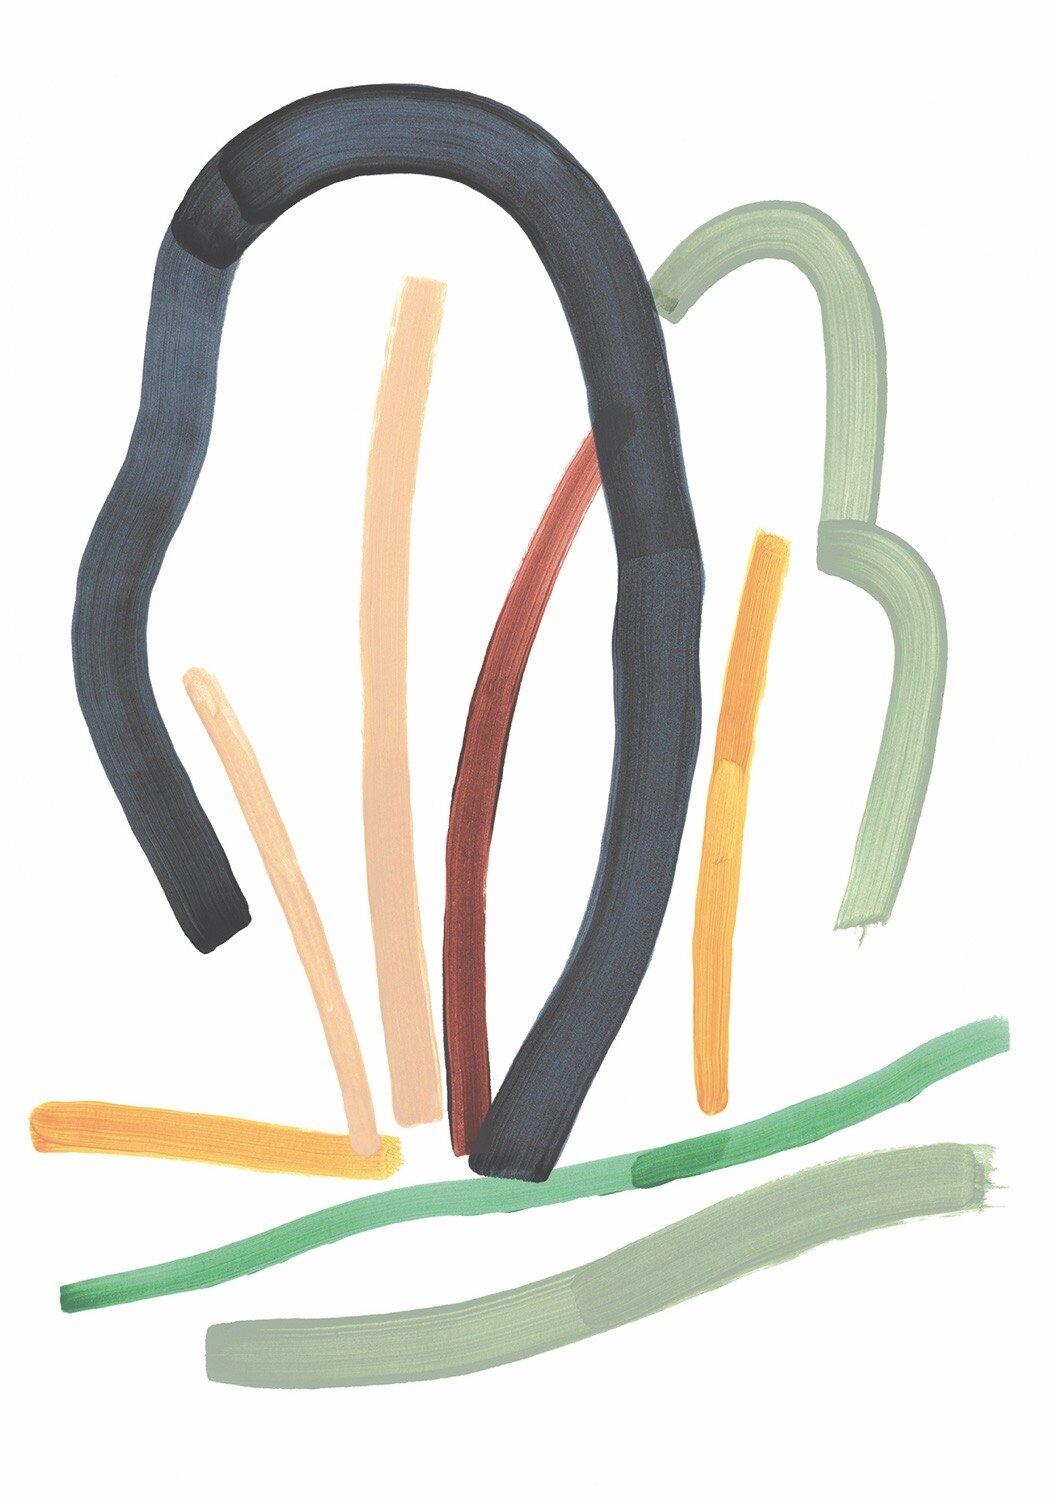 charlotte-trounce-Linnaean_Vegetable_charlottetrounce.jpg